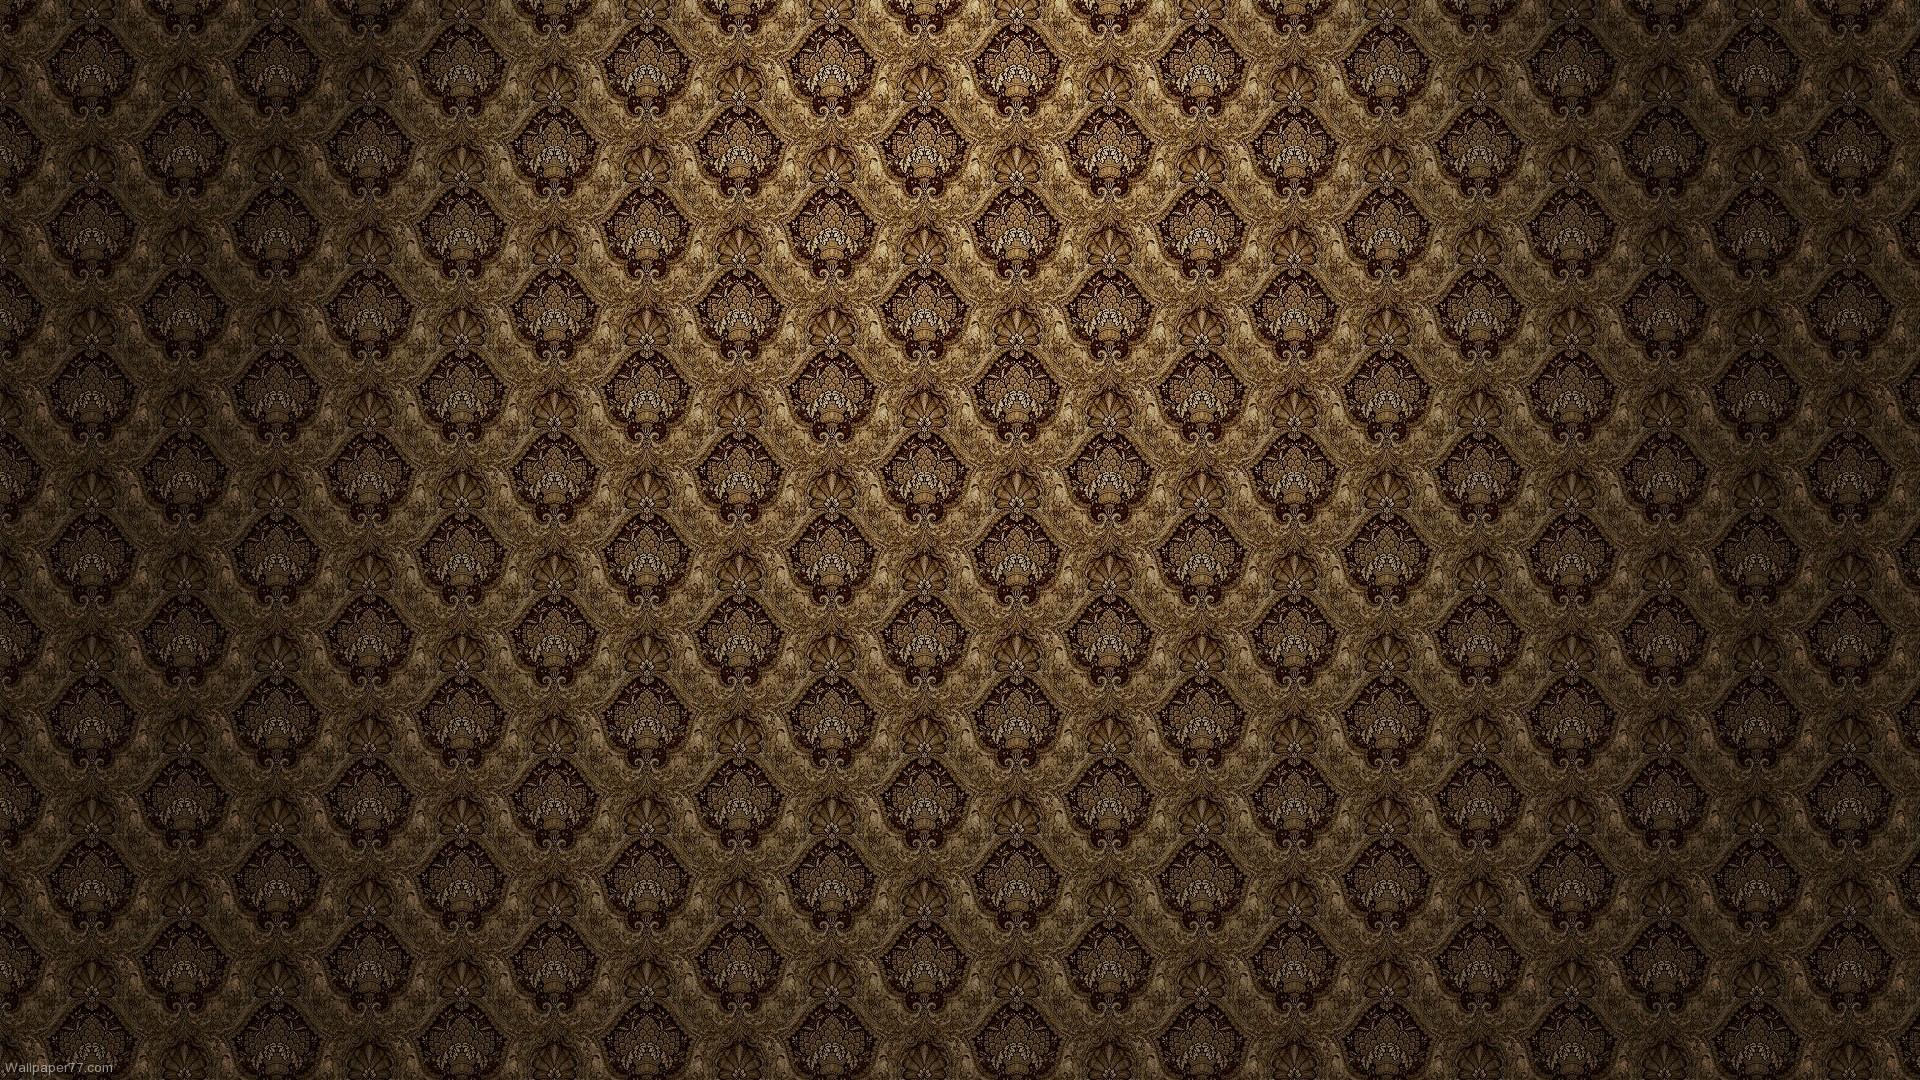 Pattern Wallpaper by Wonkajh background patterns pattern wallpapers 1920x1080